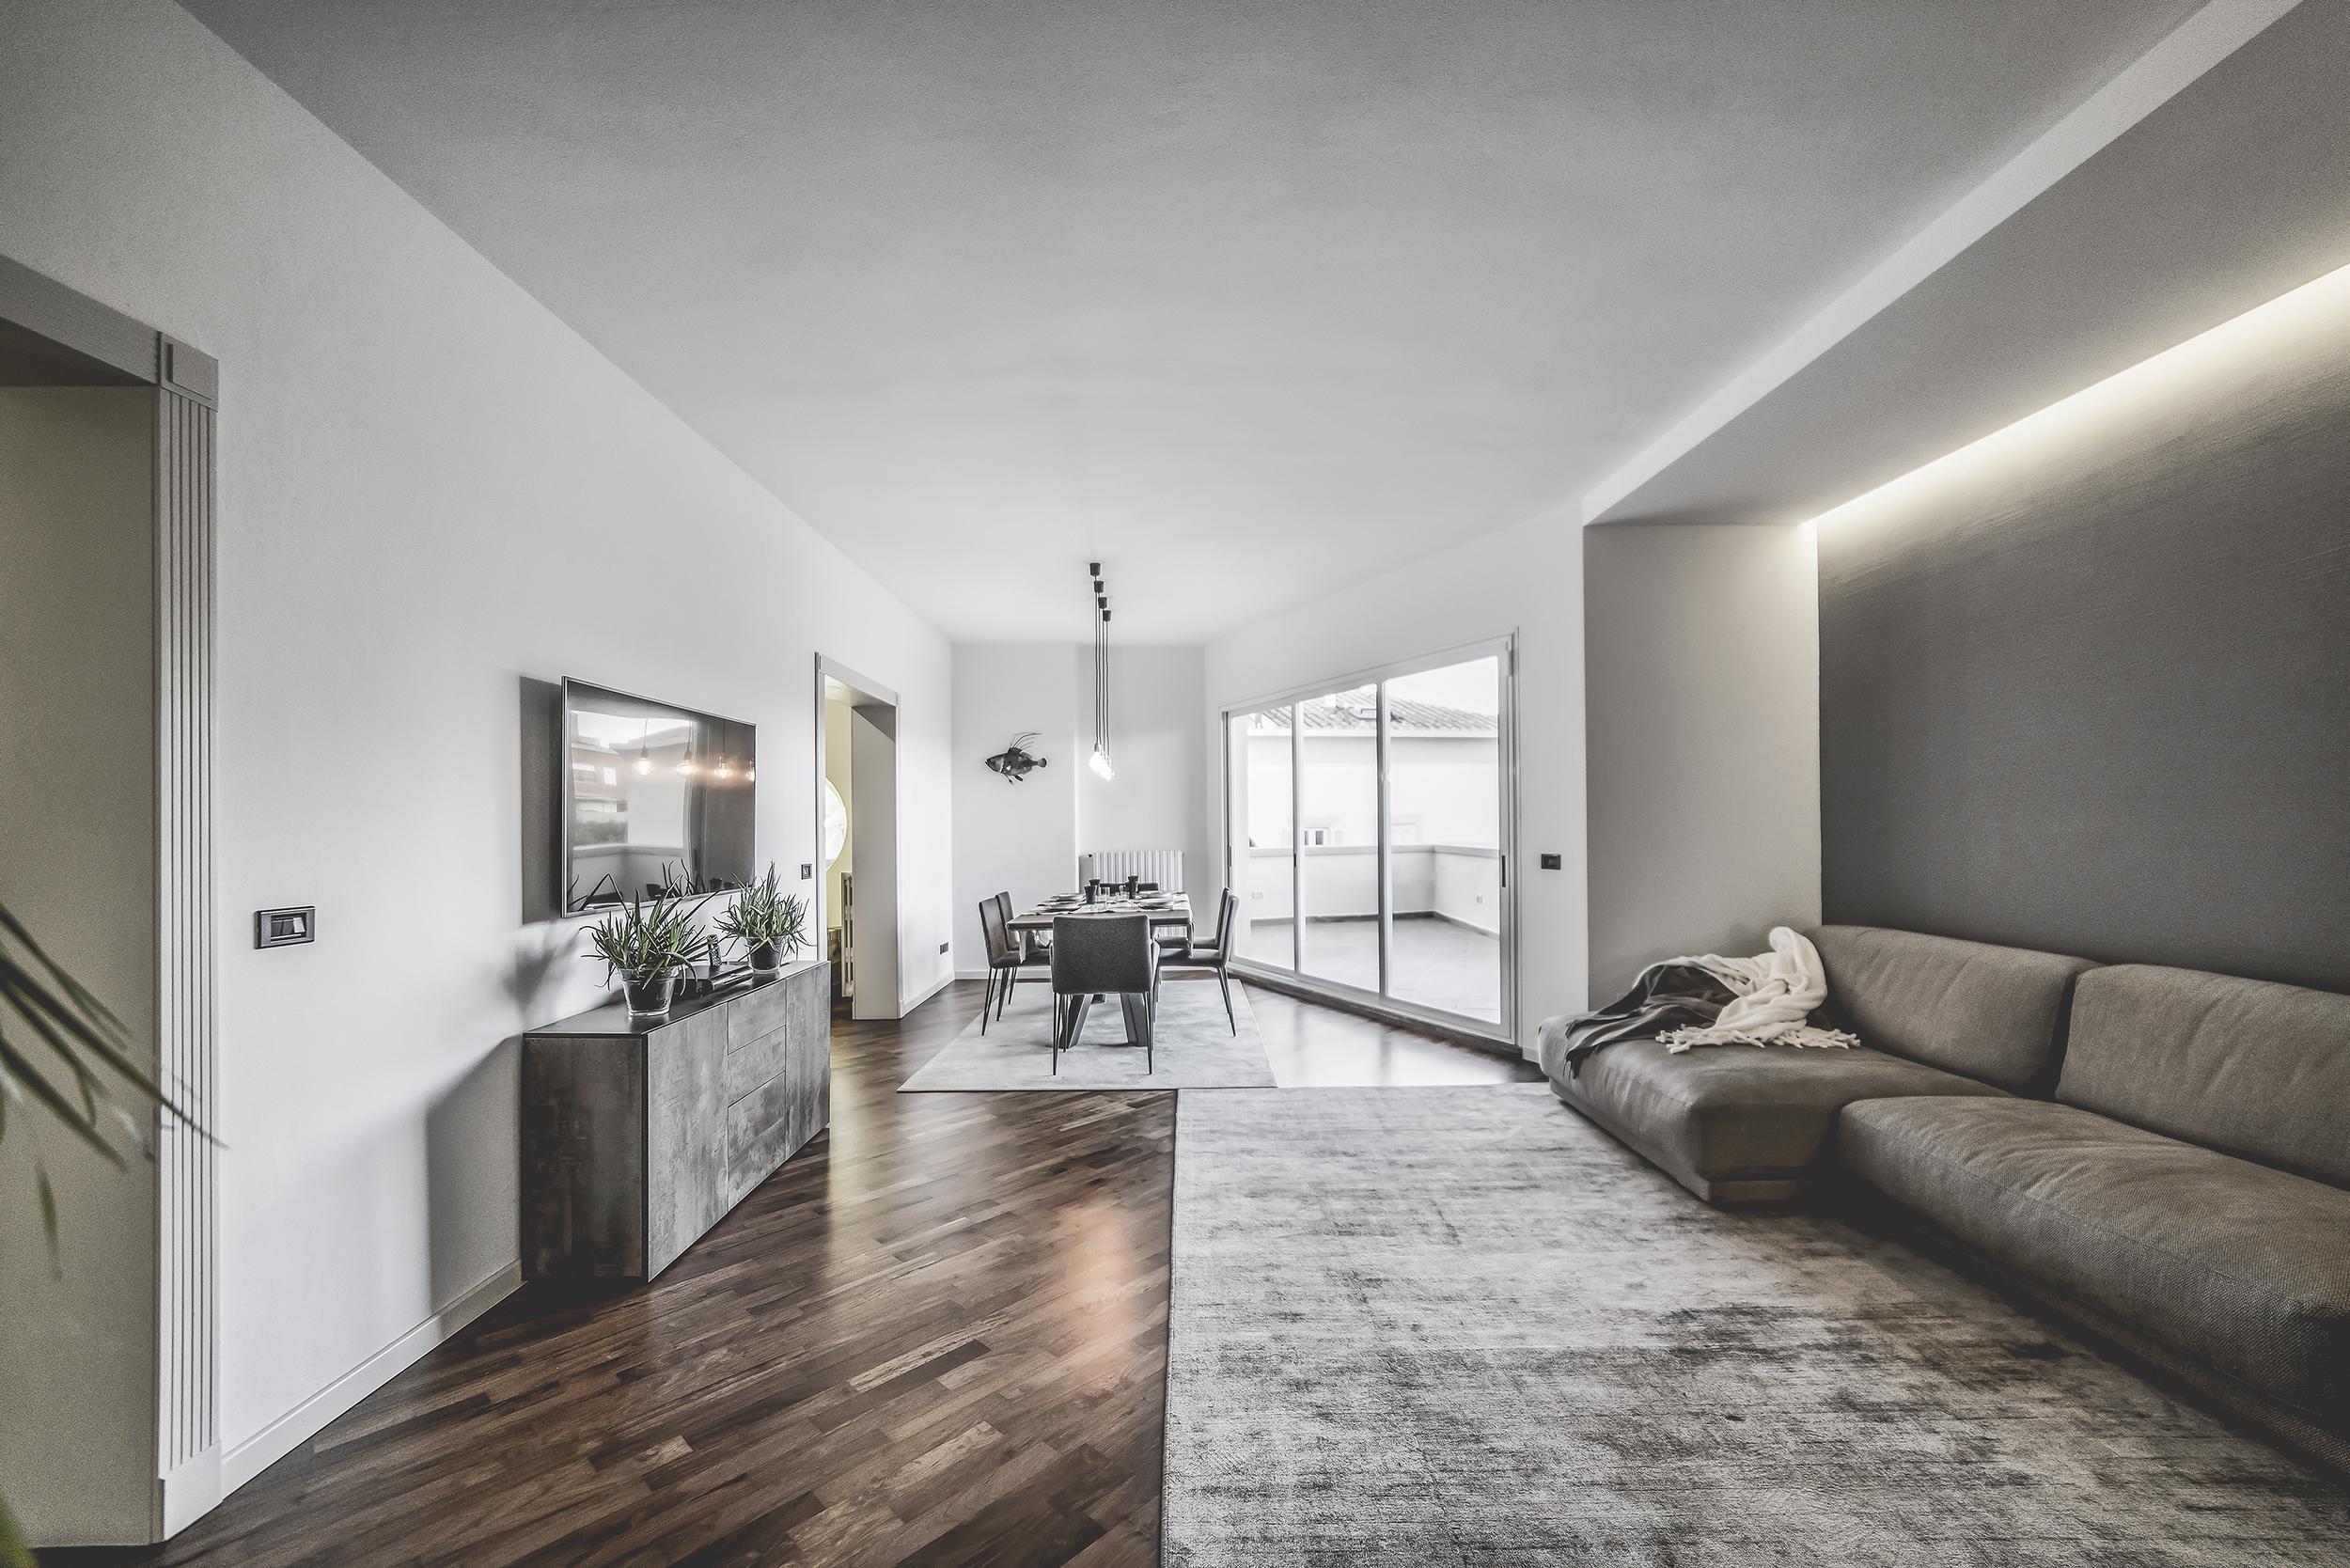 Architettura And Design terra rossa house | modo architettura + design | media